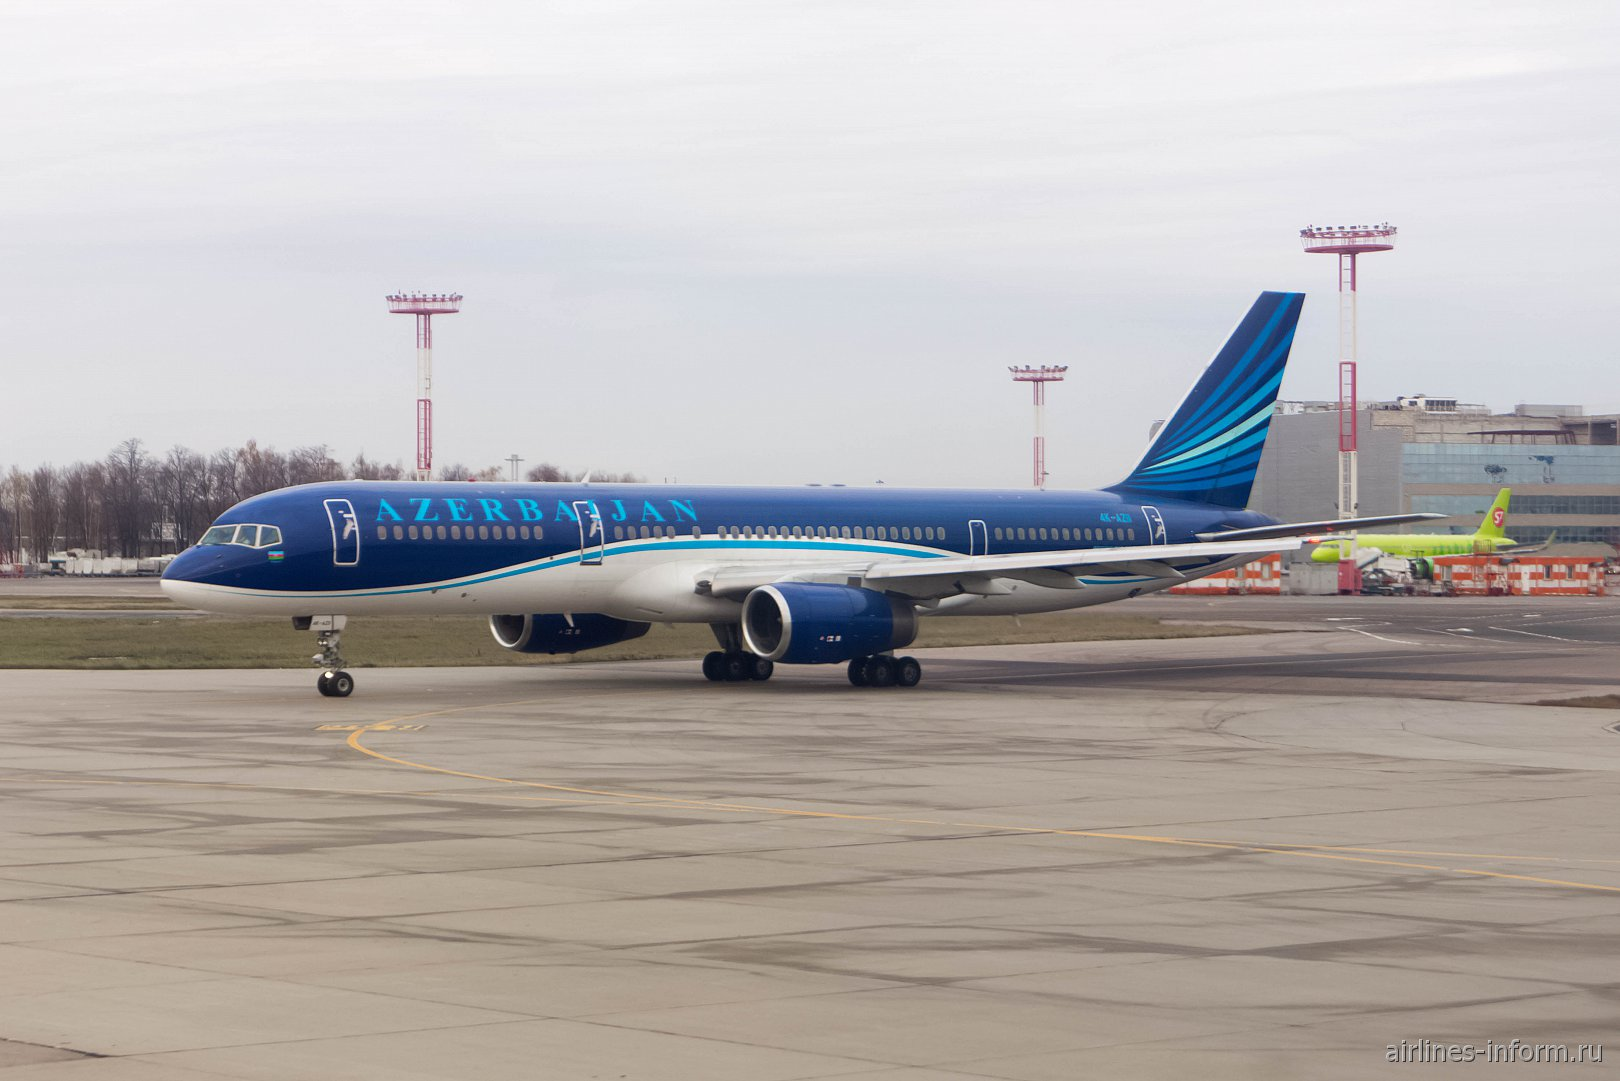 Боинг-757-200 Азербайджанский авиалиний в аэропорту Домодедово